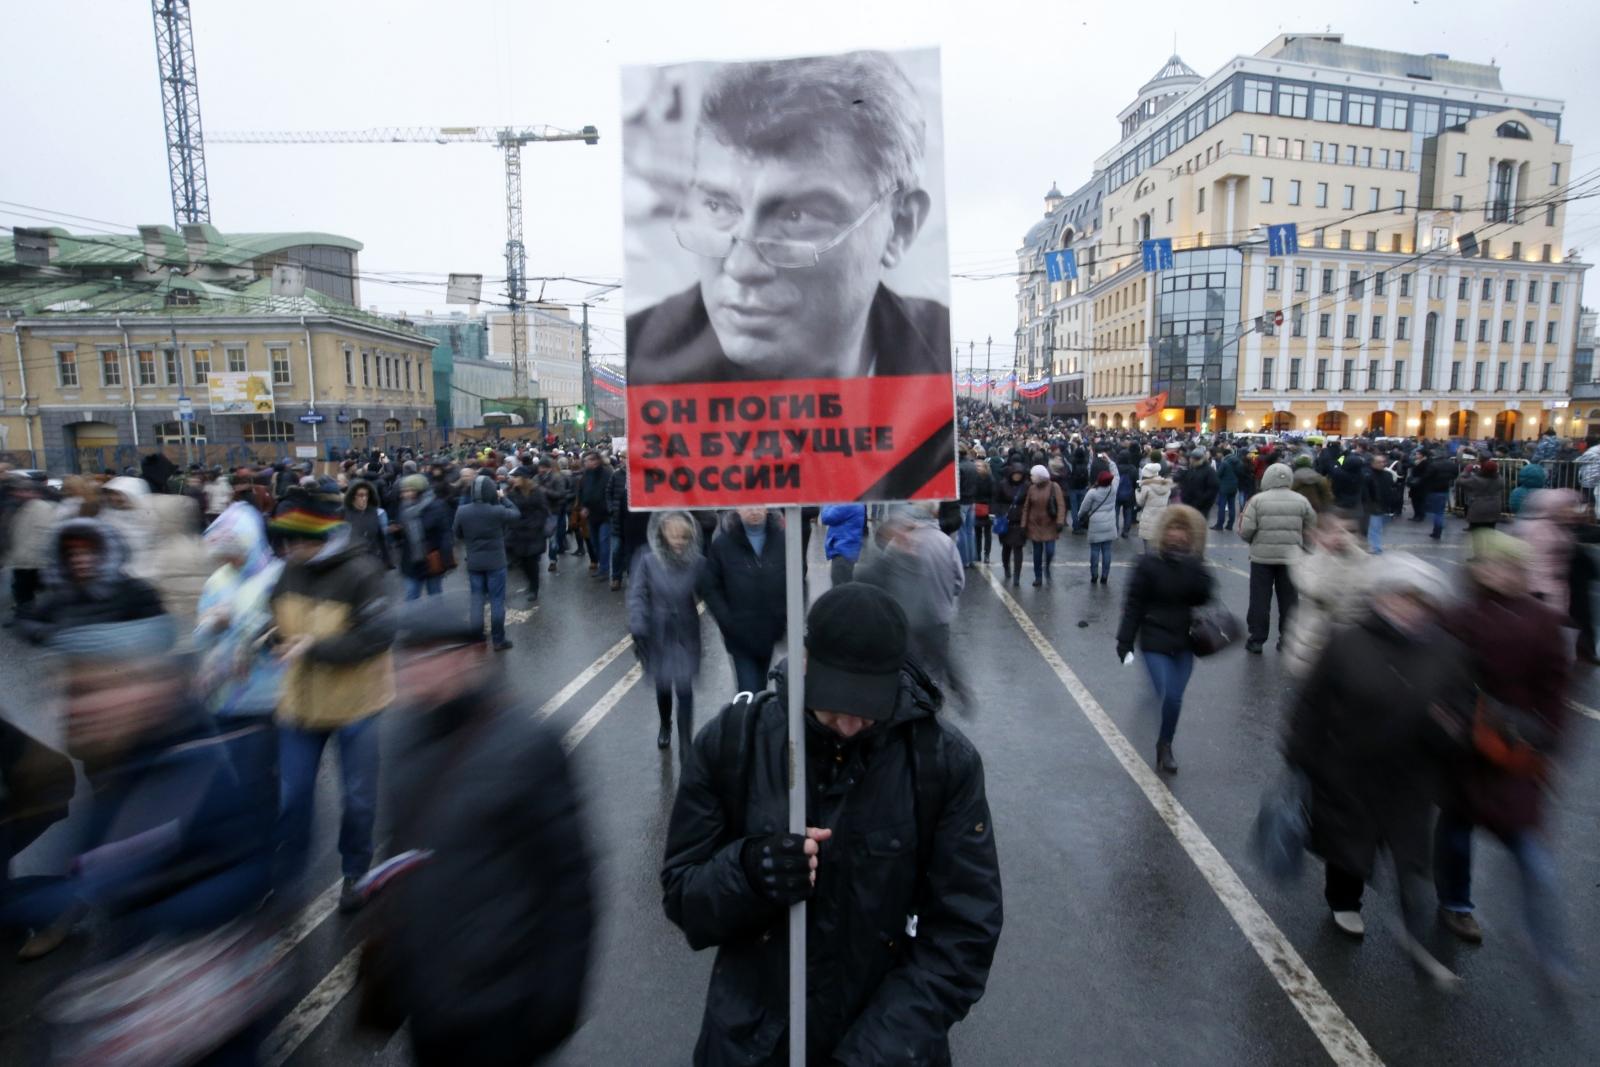 March in memory of Boris Nemtsov